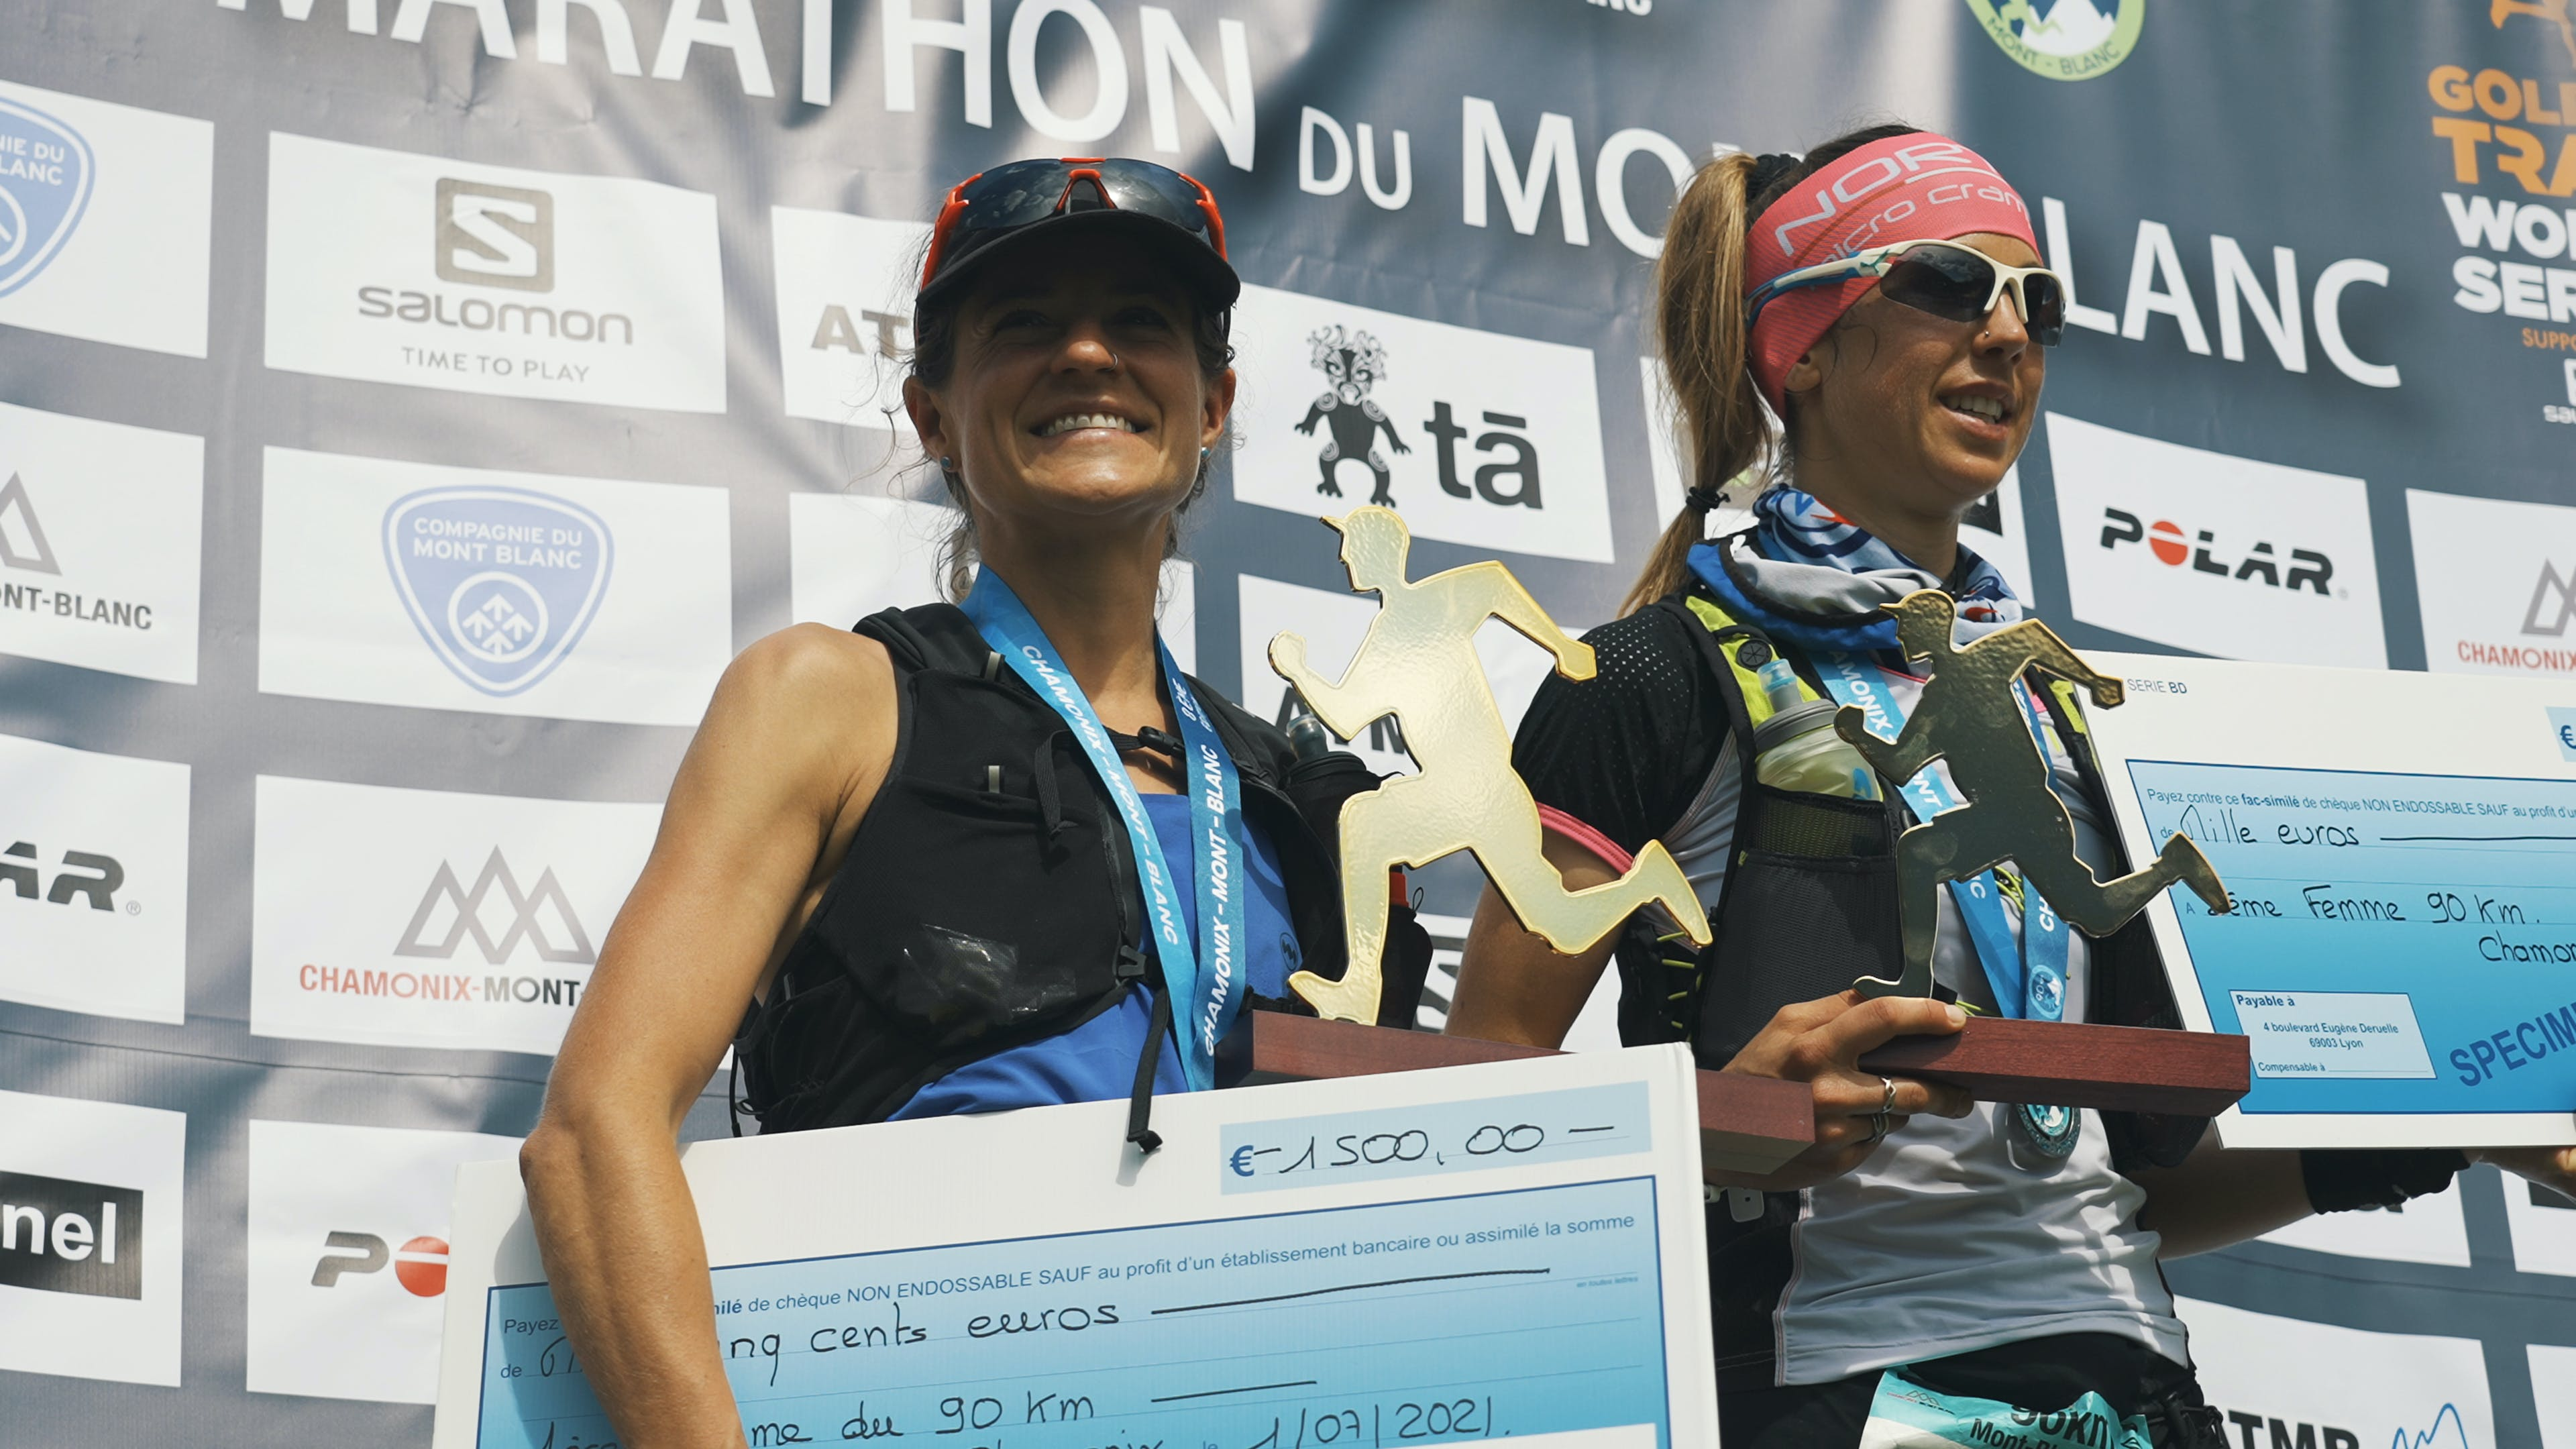 Black Diamond athlete Hillary Gerardi on the 90k du Mont Blanc podium